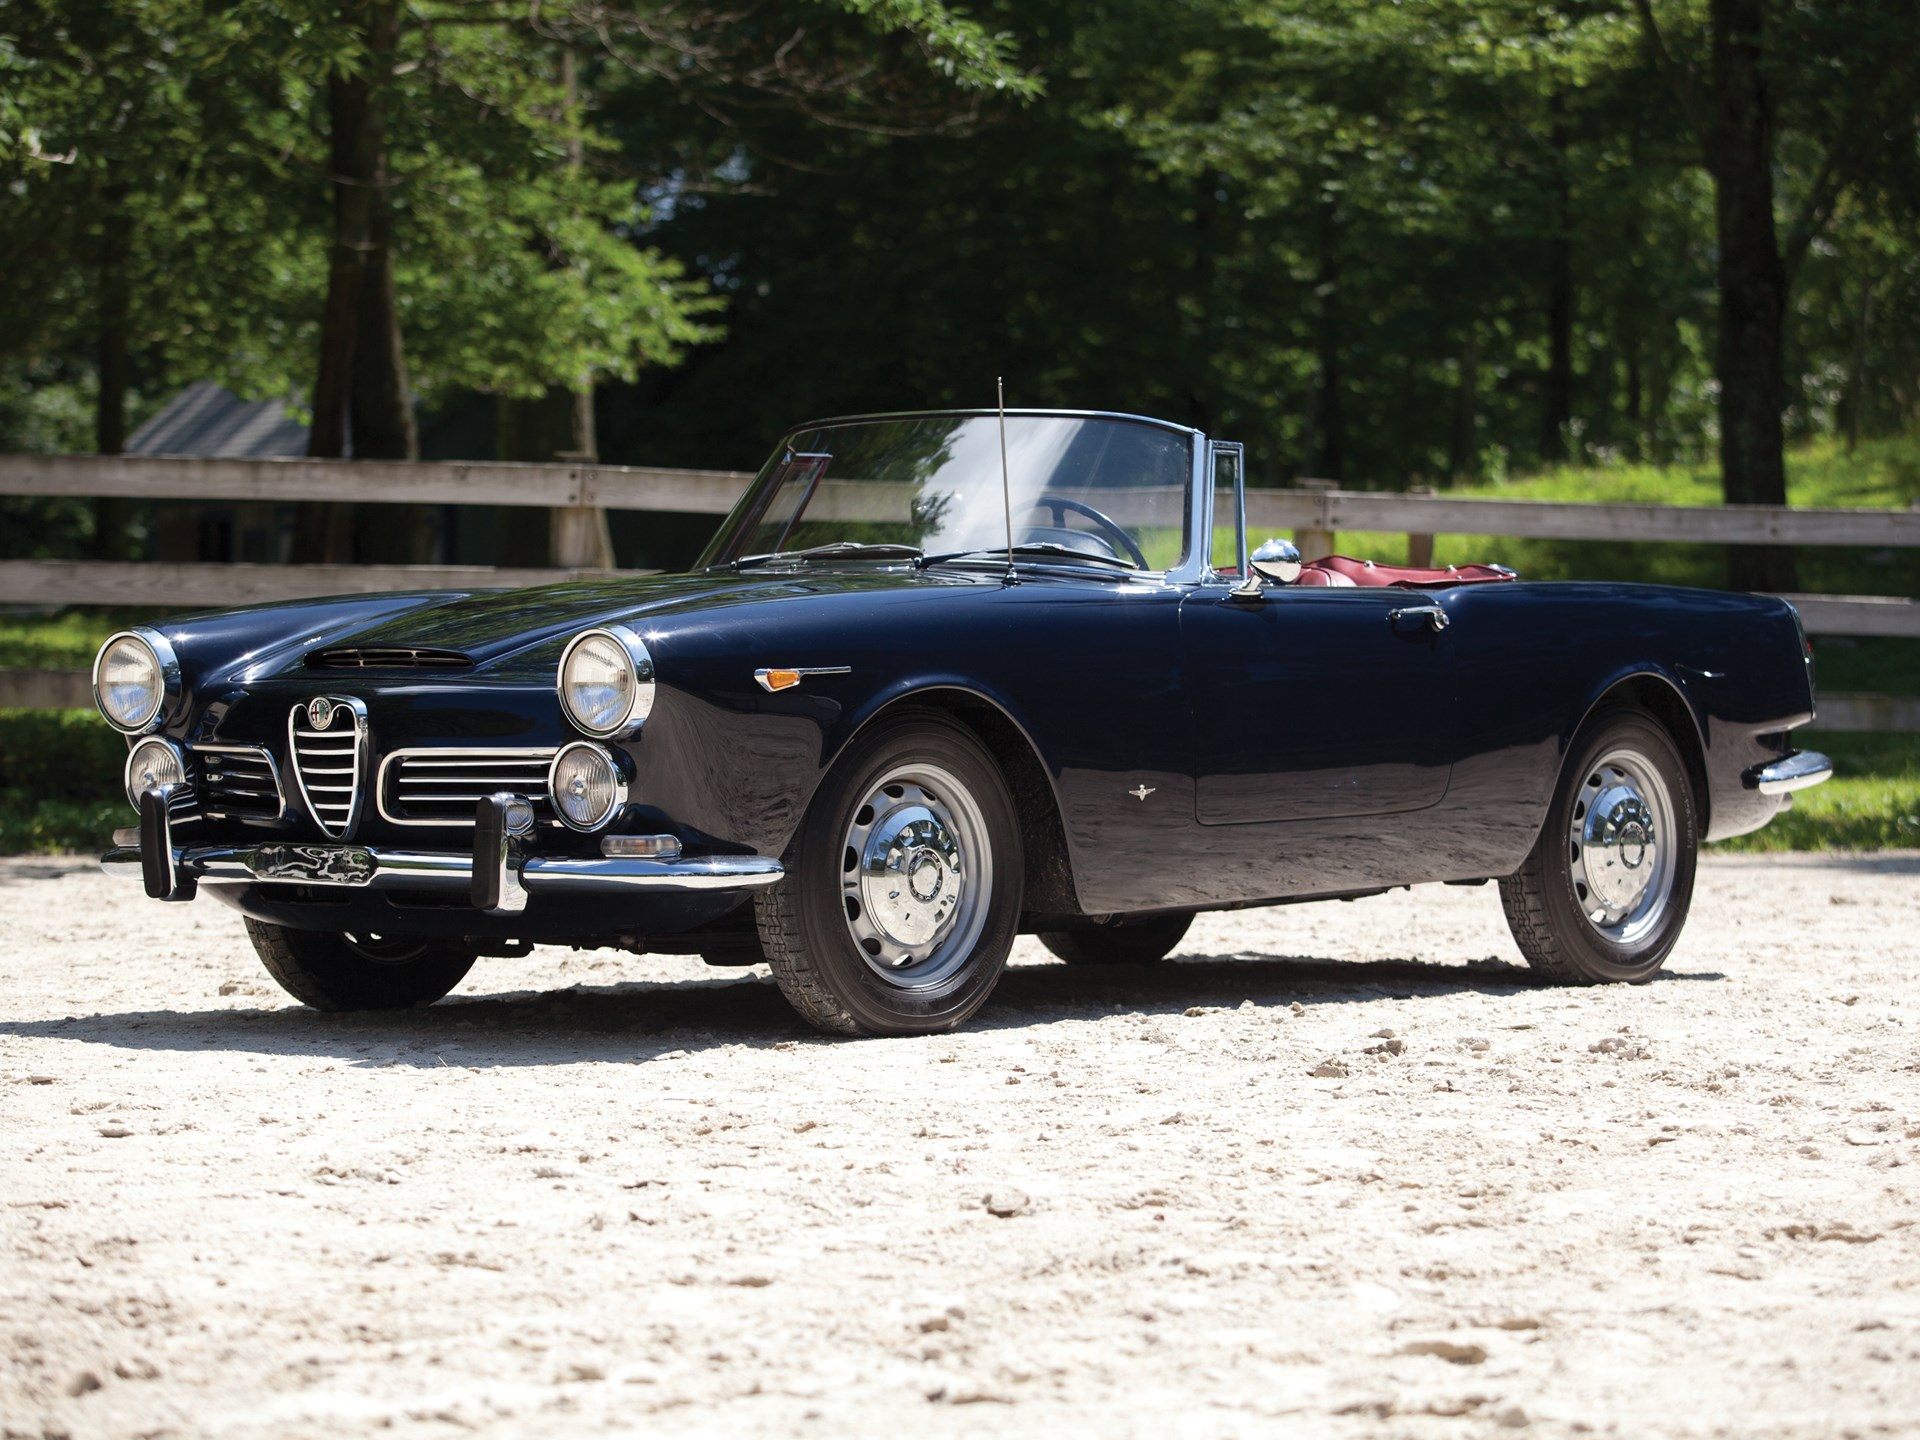 1965 Alfa Romeo 2600 Spider by Touring